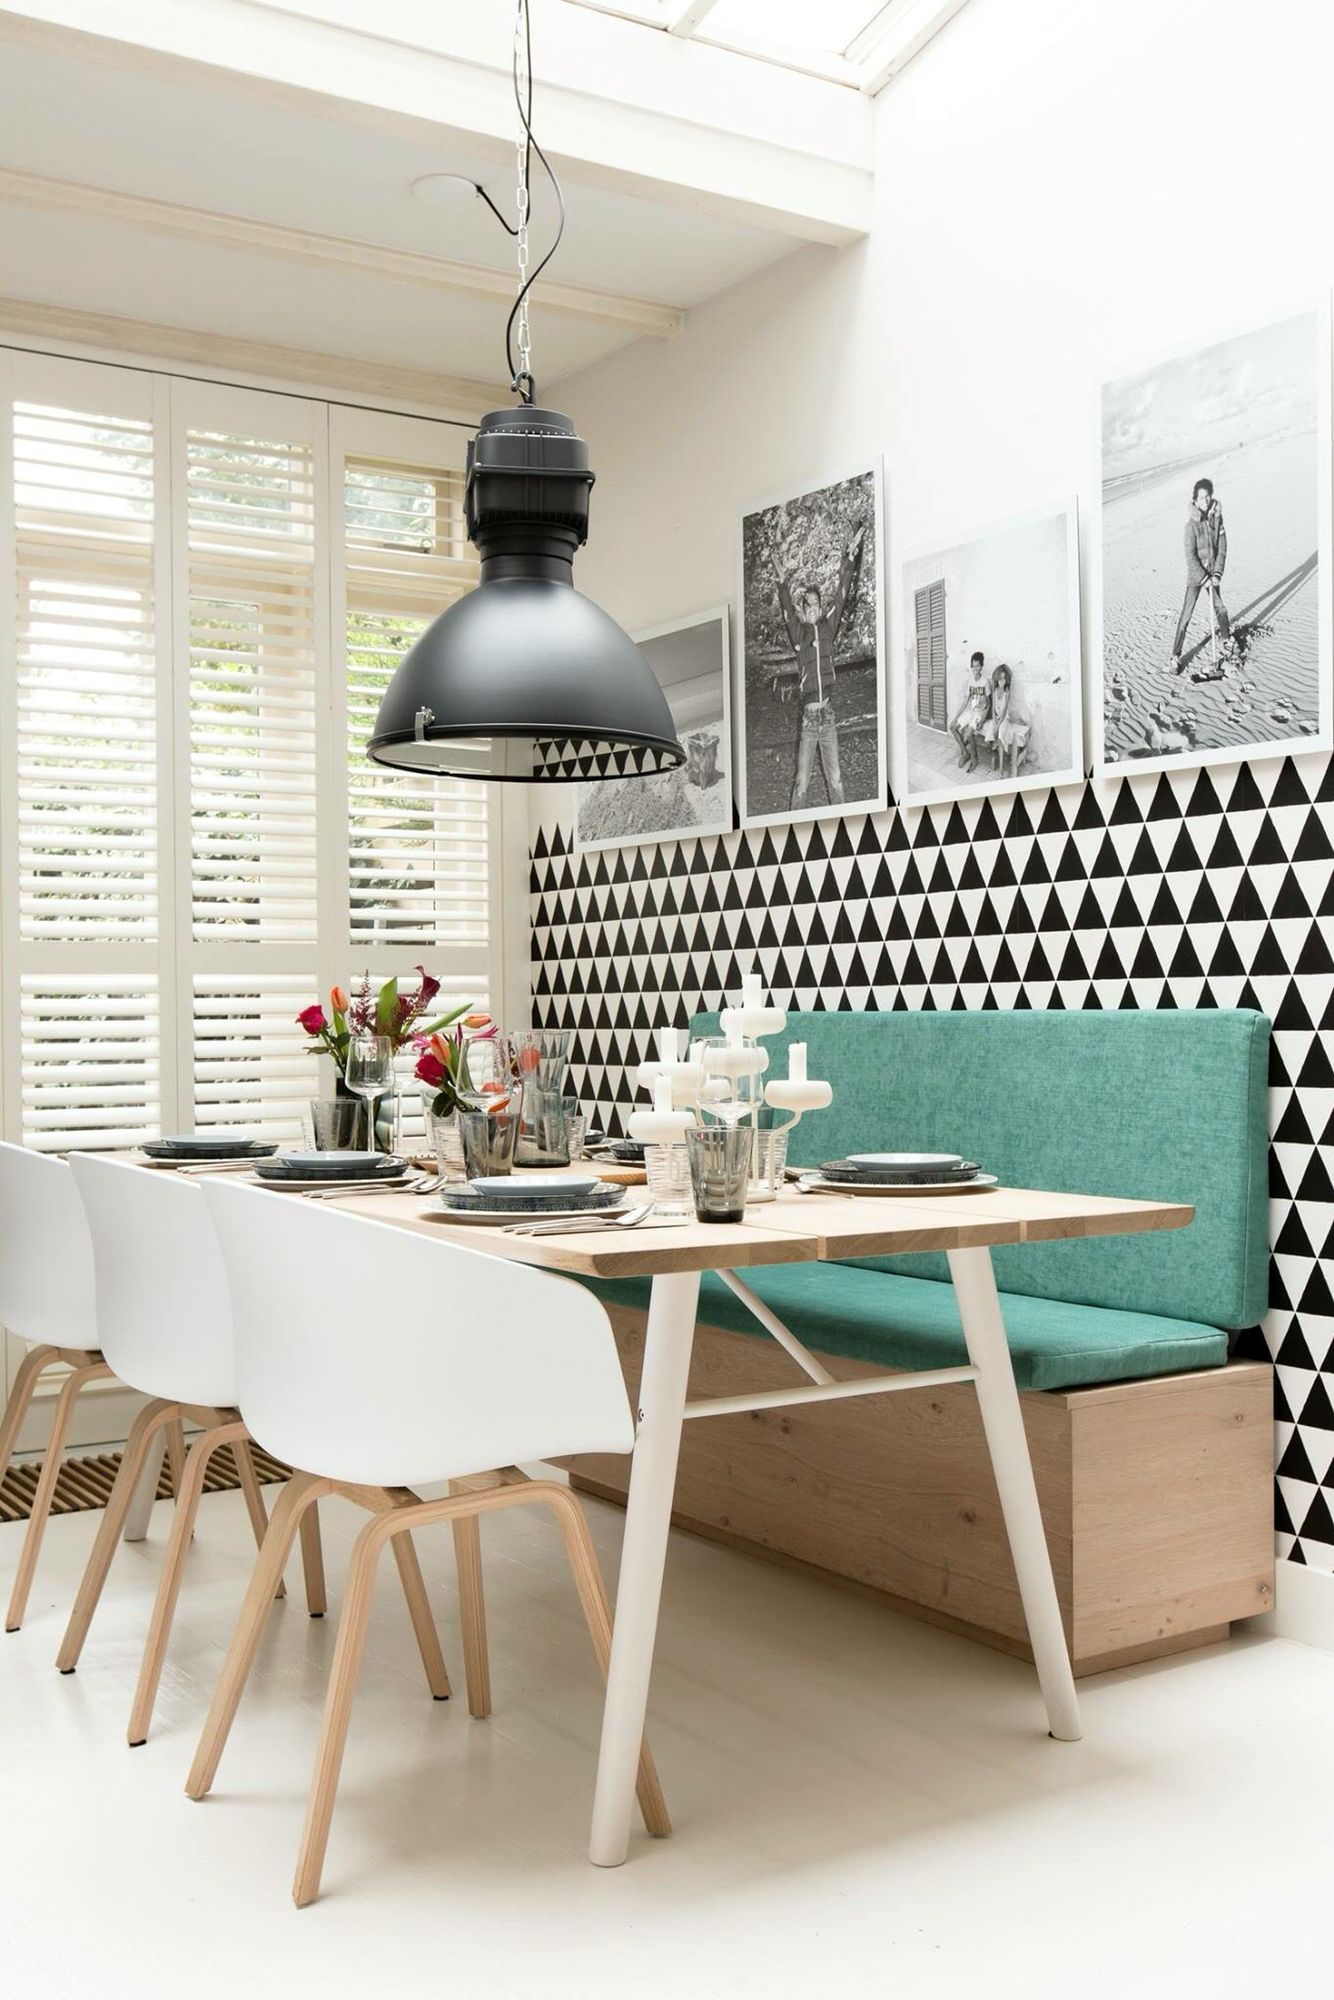 Vt Wonen Eijerkamp Metamorfose Split Dining Table From Woud Fair Booth Dining Room Table Design Decoration